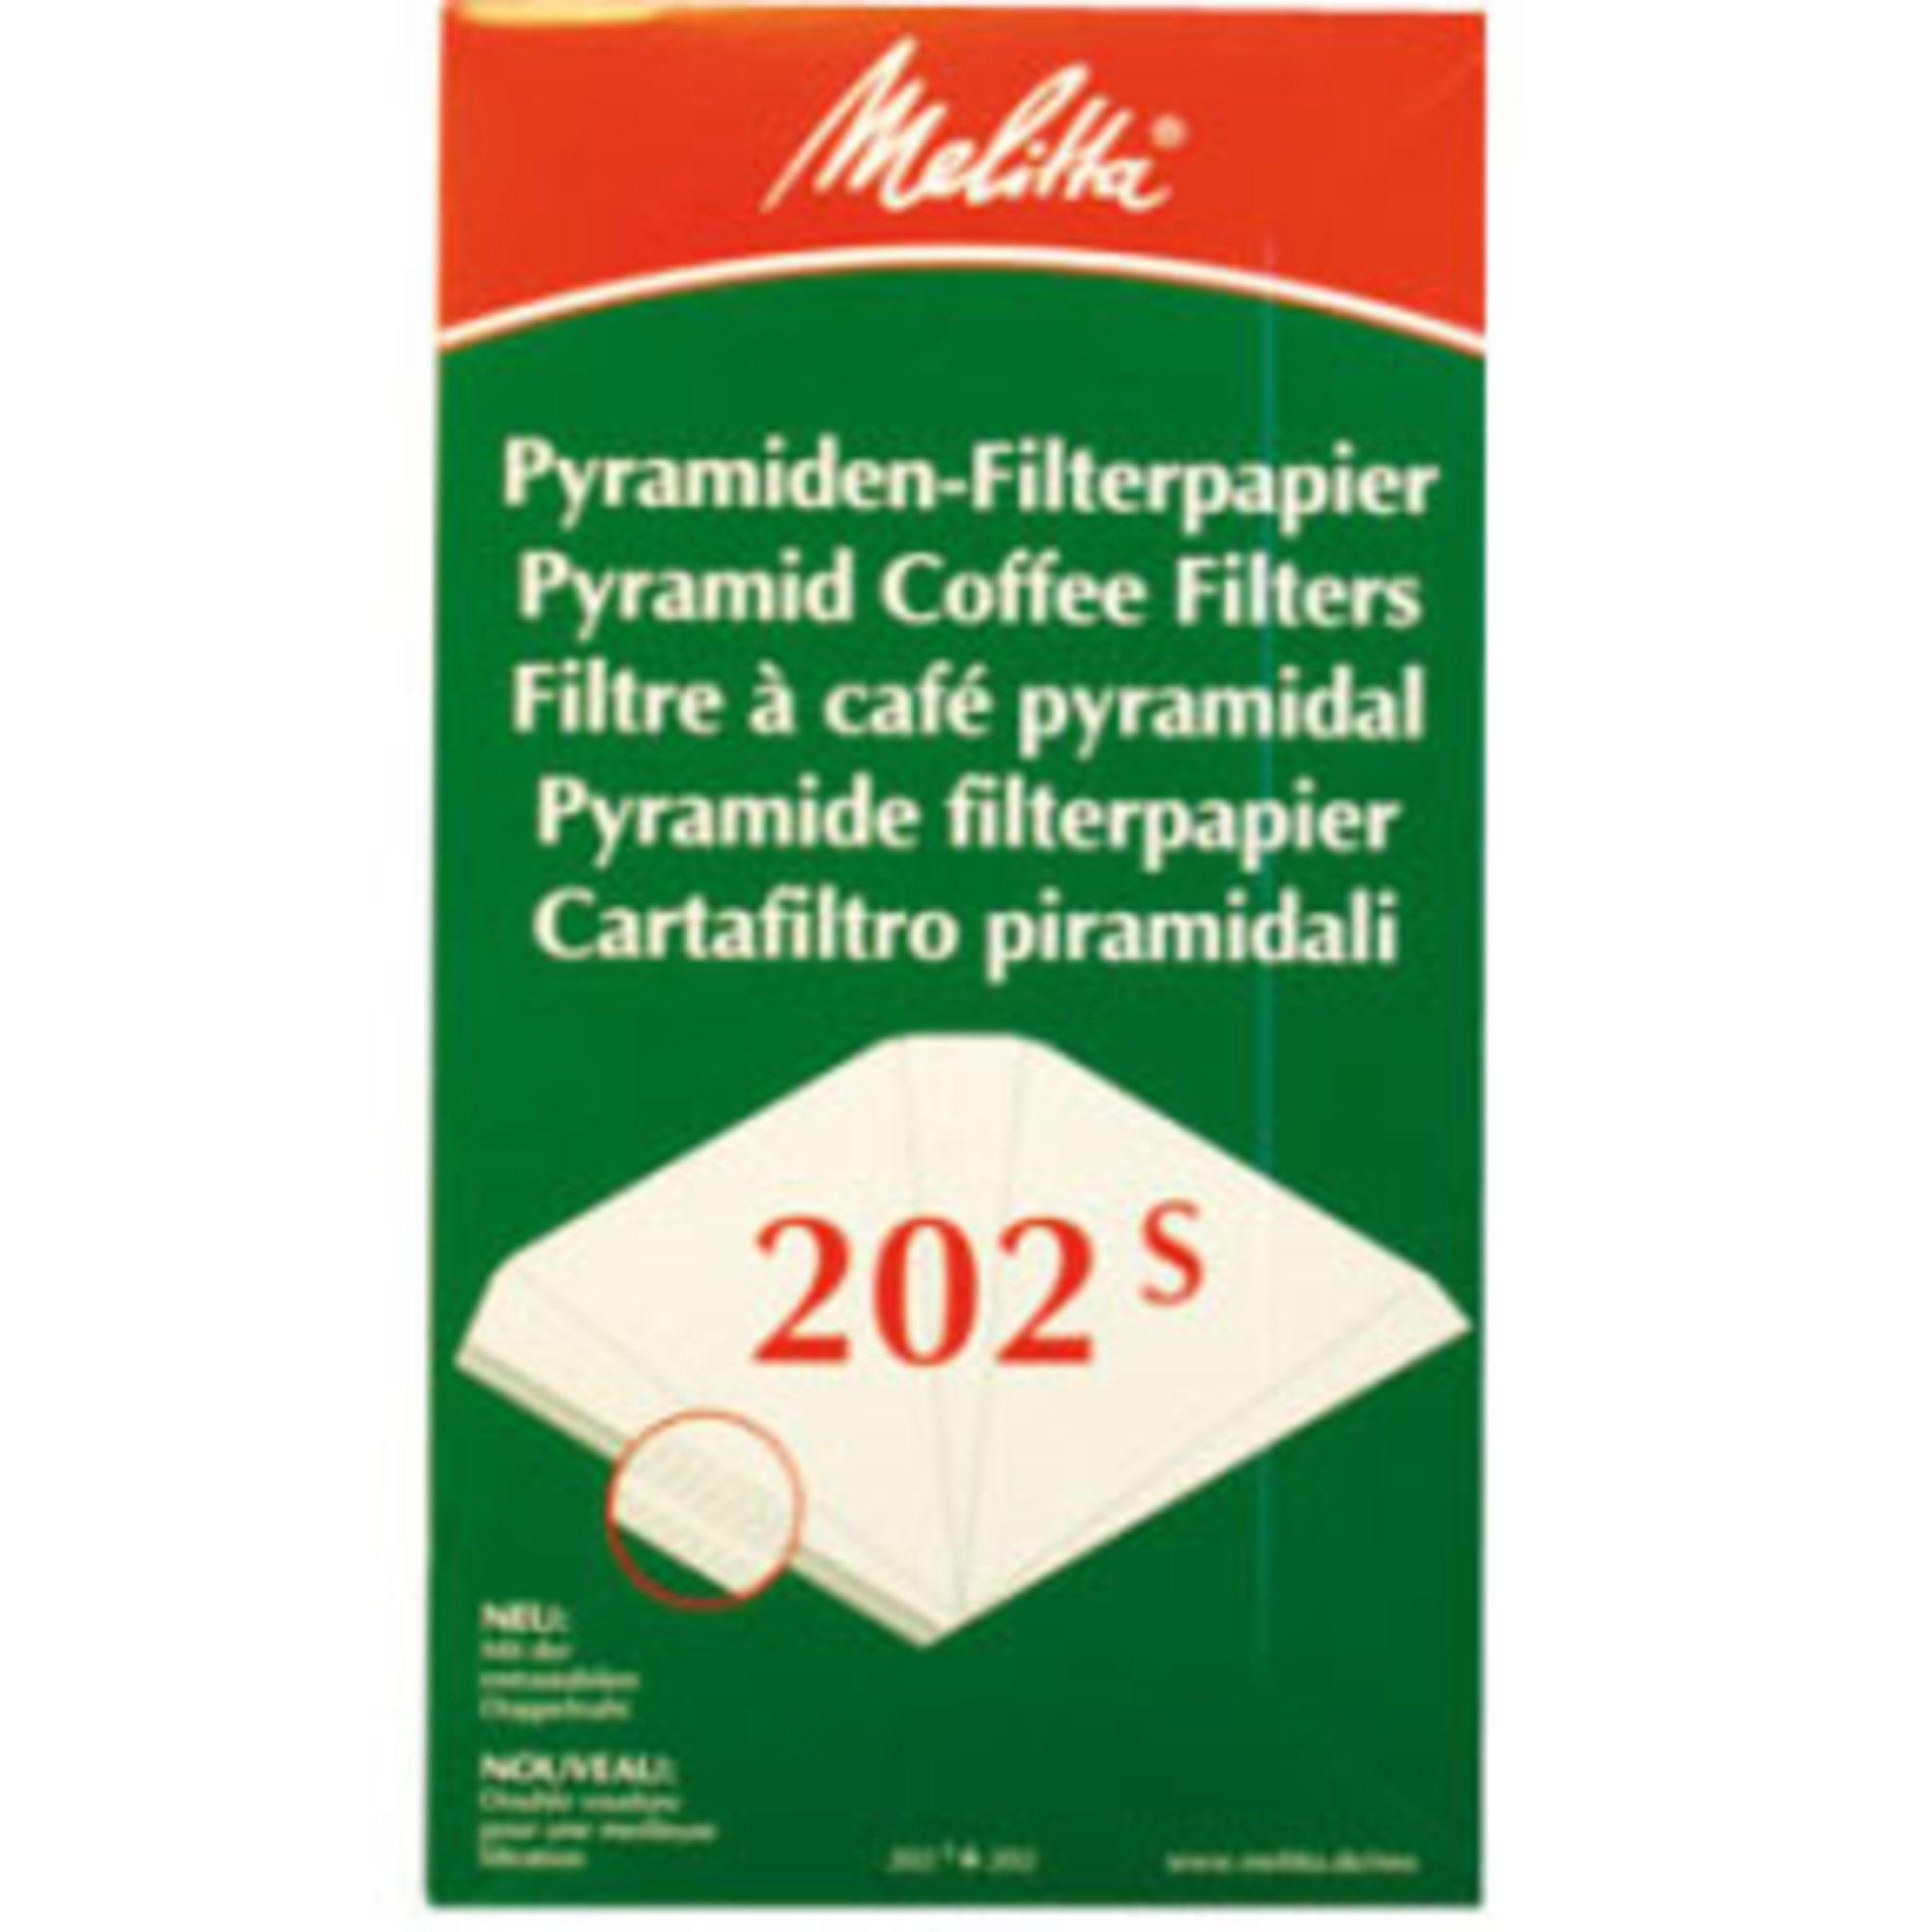 Melitta Kaffefilter 202 Pyramidfilter